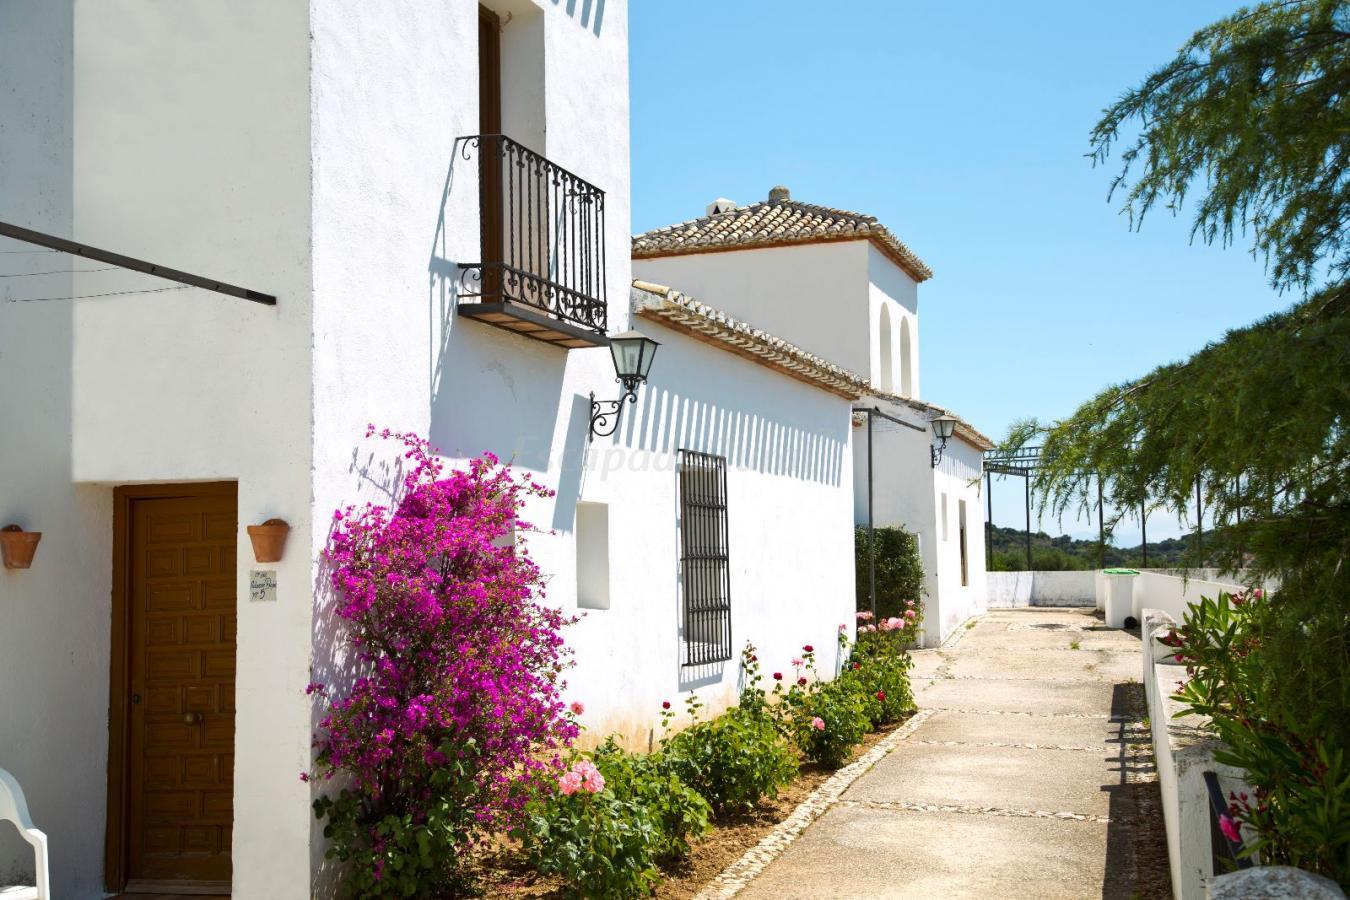 Fotos de hotel villa de priego de c rdoba casa rural en priego de c rdoba c rdoba - Casa rural priego de cordoba ...